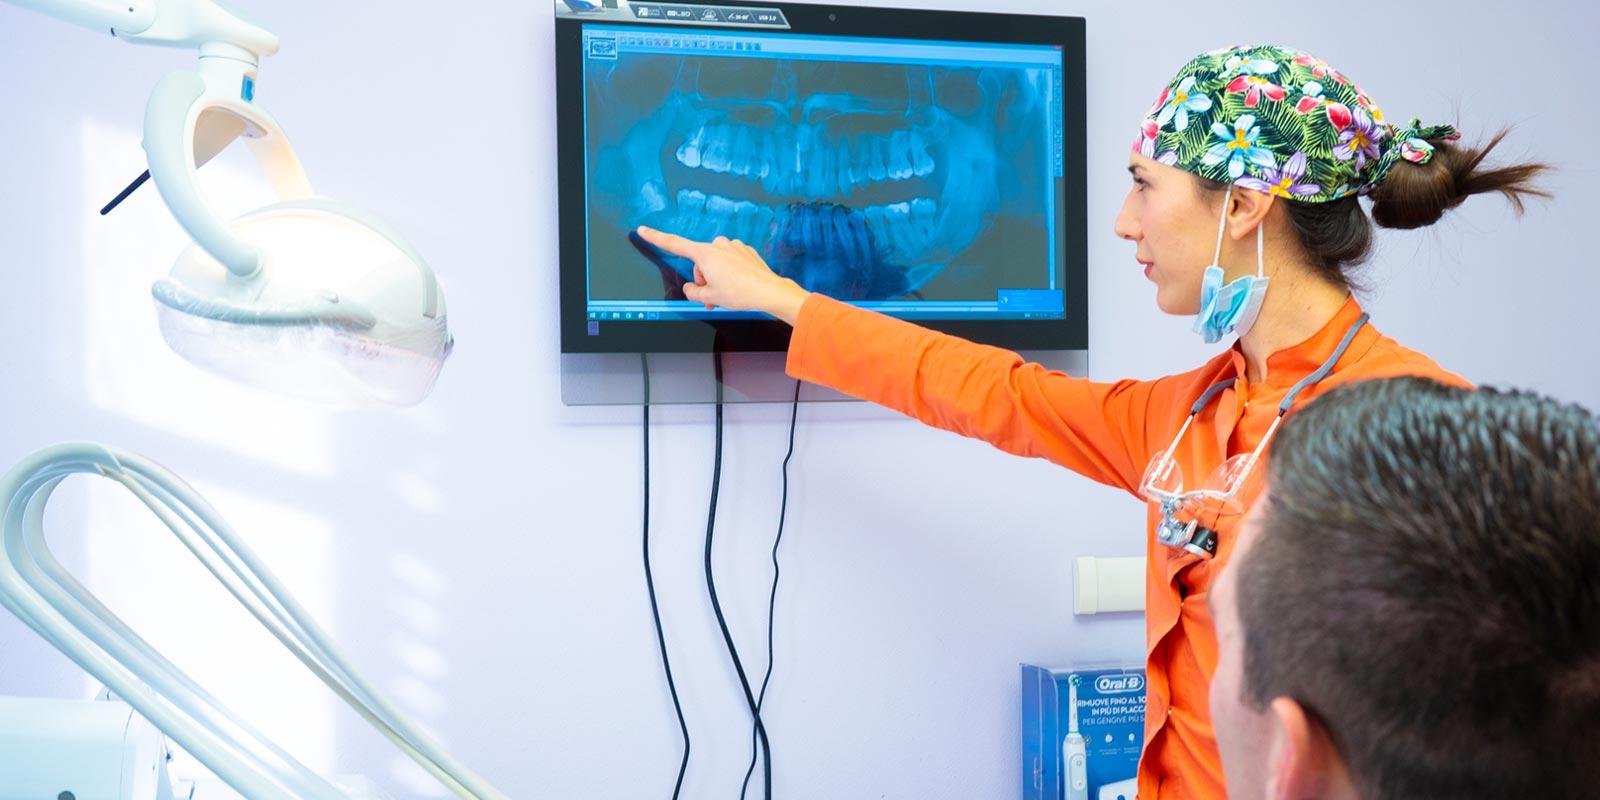 studio-dentistico-dottor-gola-casteggio-odontoiatria-pavia-dentista-implantologia-ortodonzia-protesi-chirurgia-63